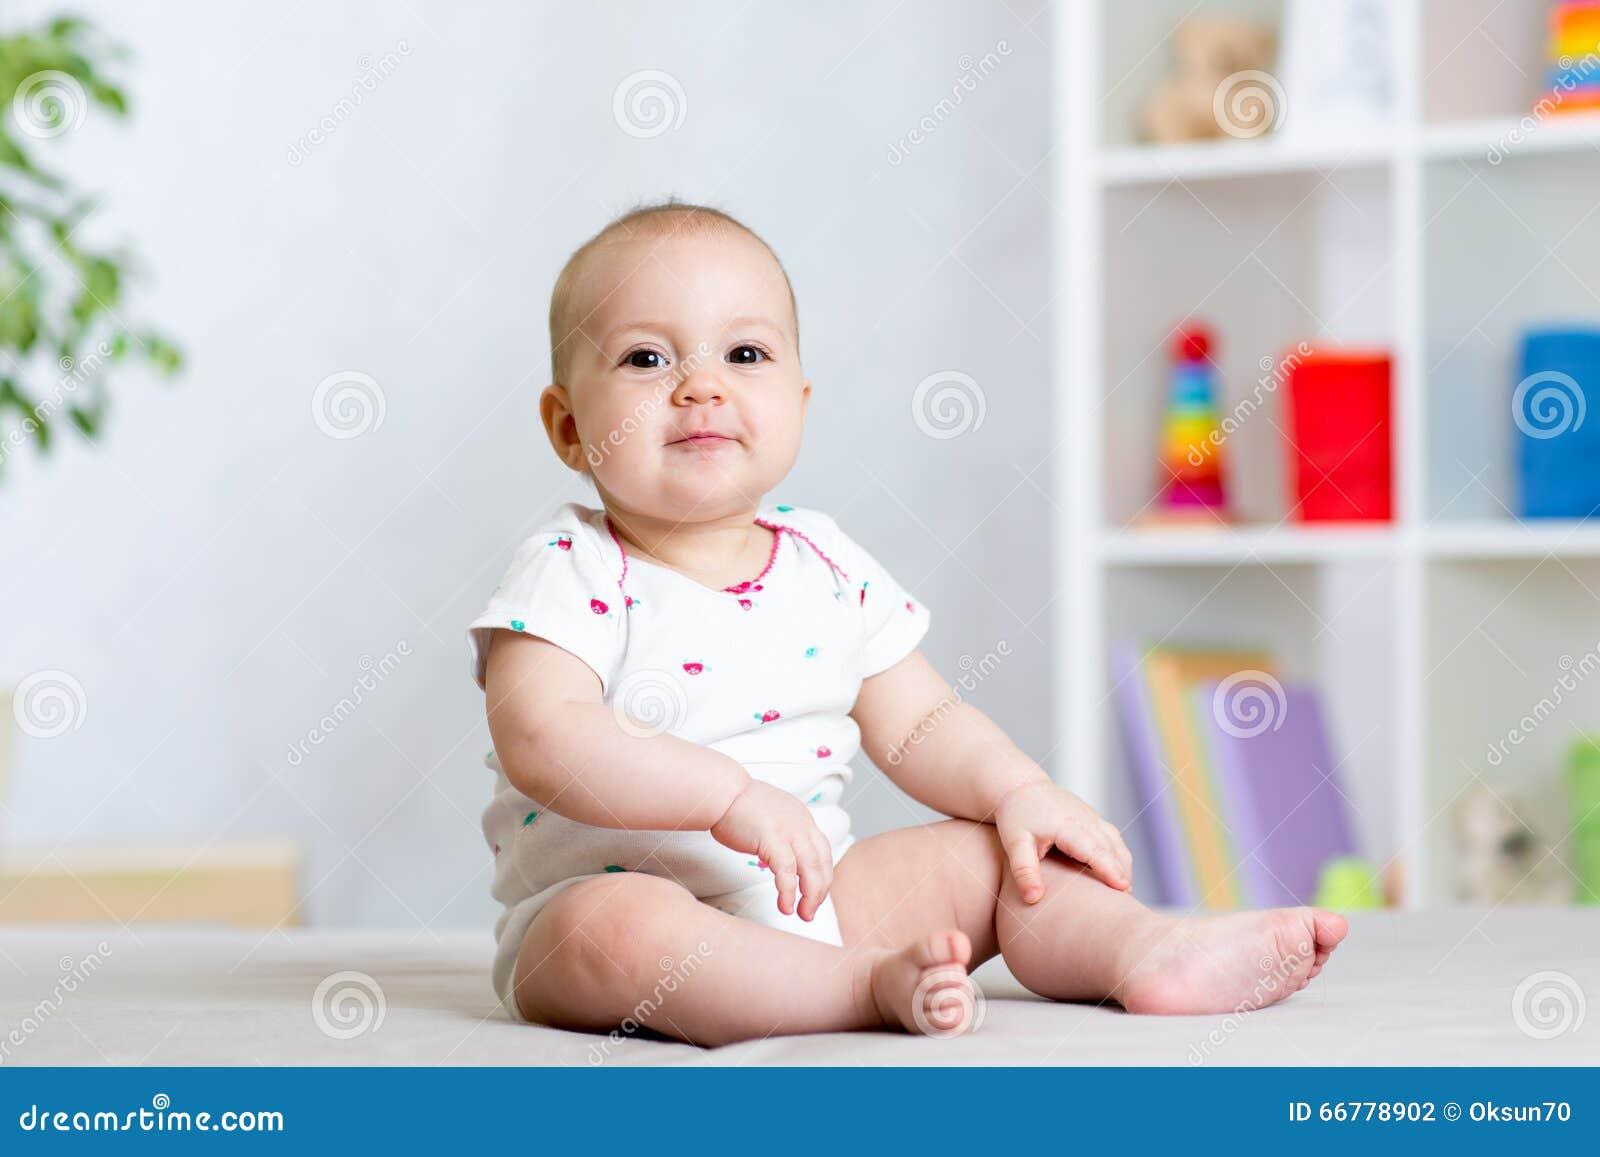 Funny baby kid girl sitting on floor in children room